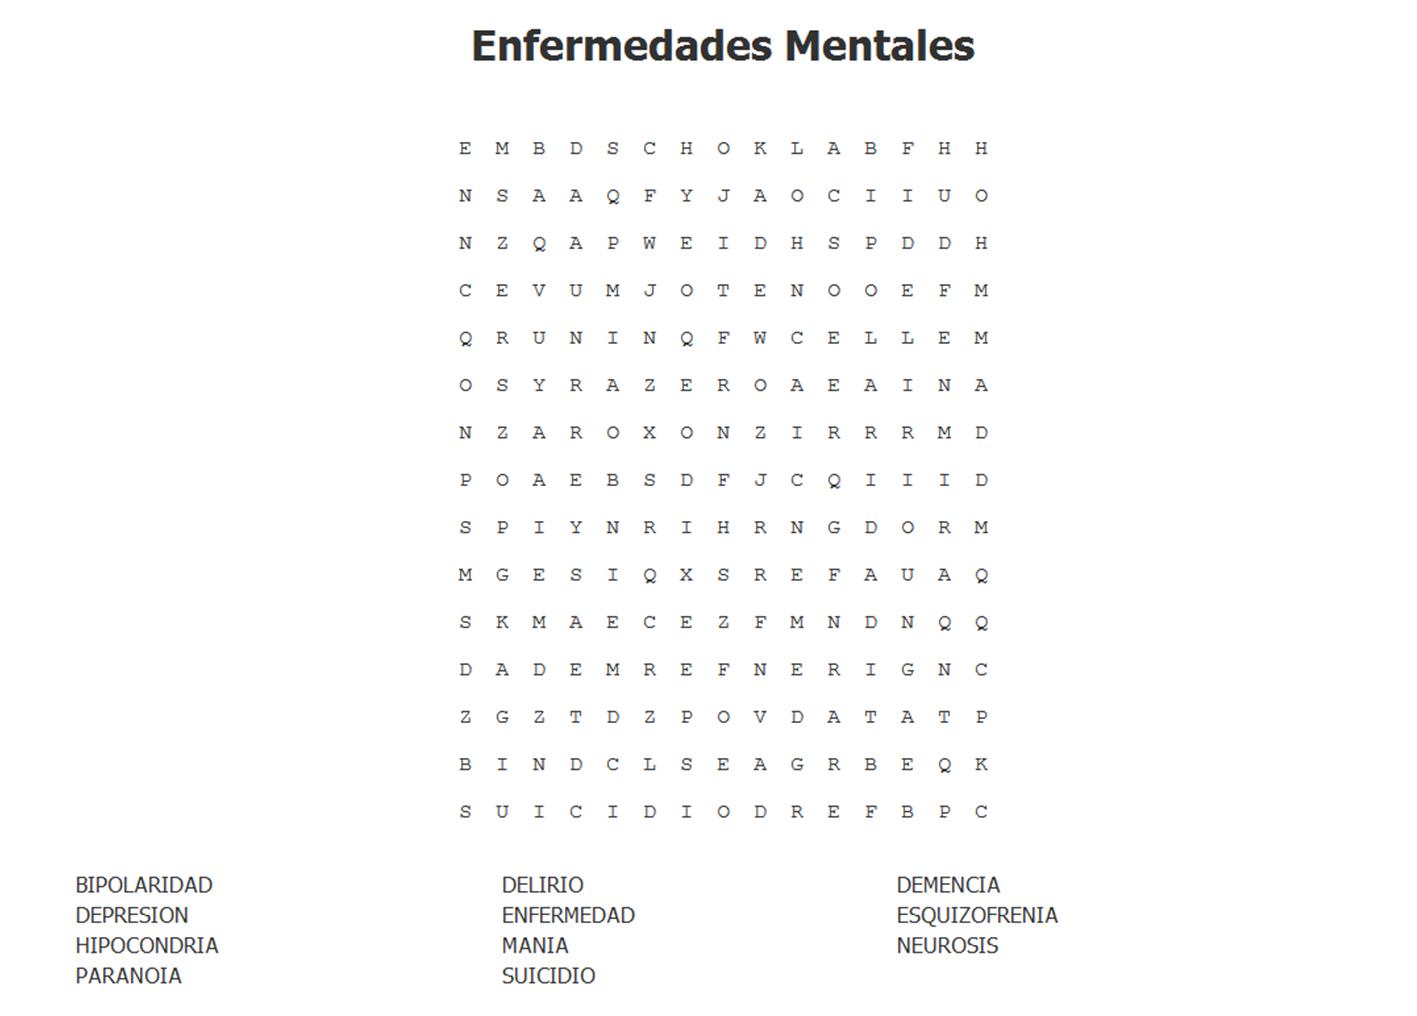 Dra Matesanz Sopa De Letras De Enfermedades Mentales